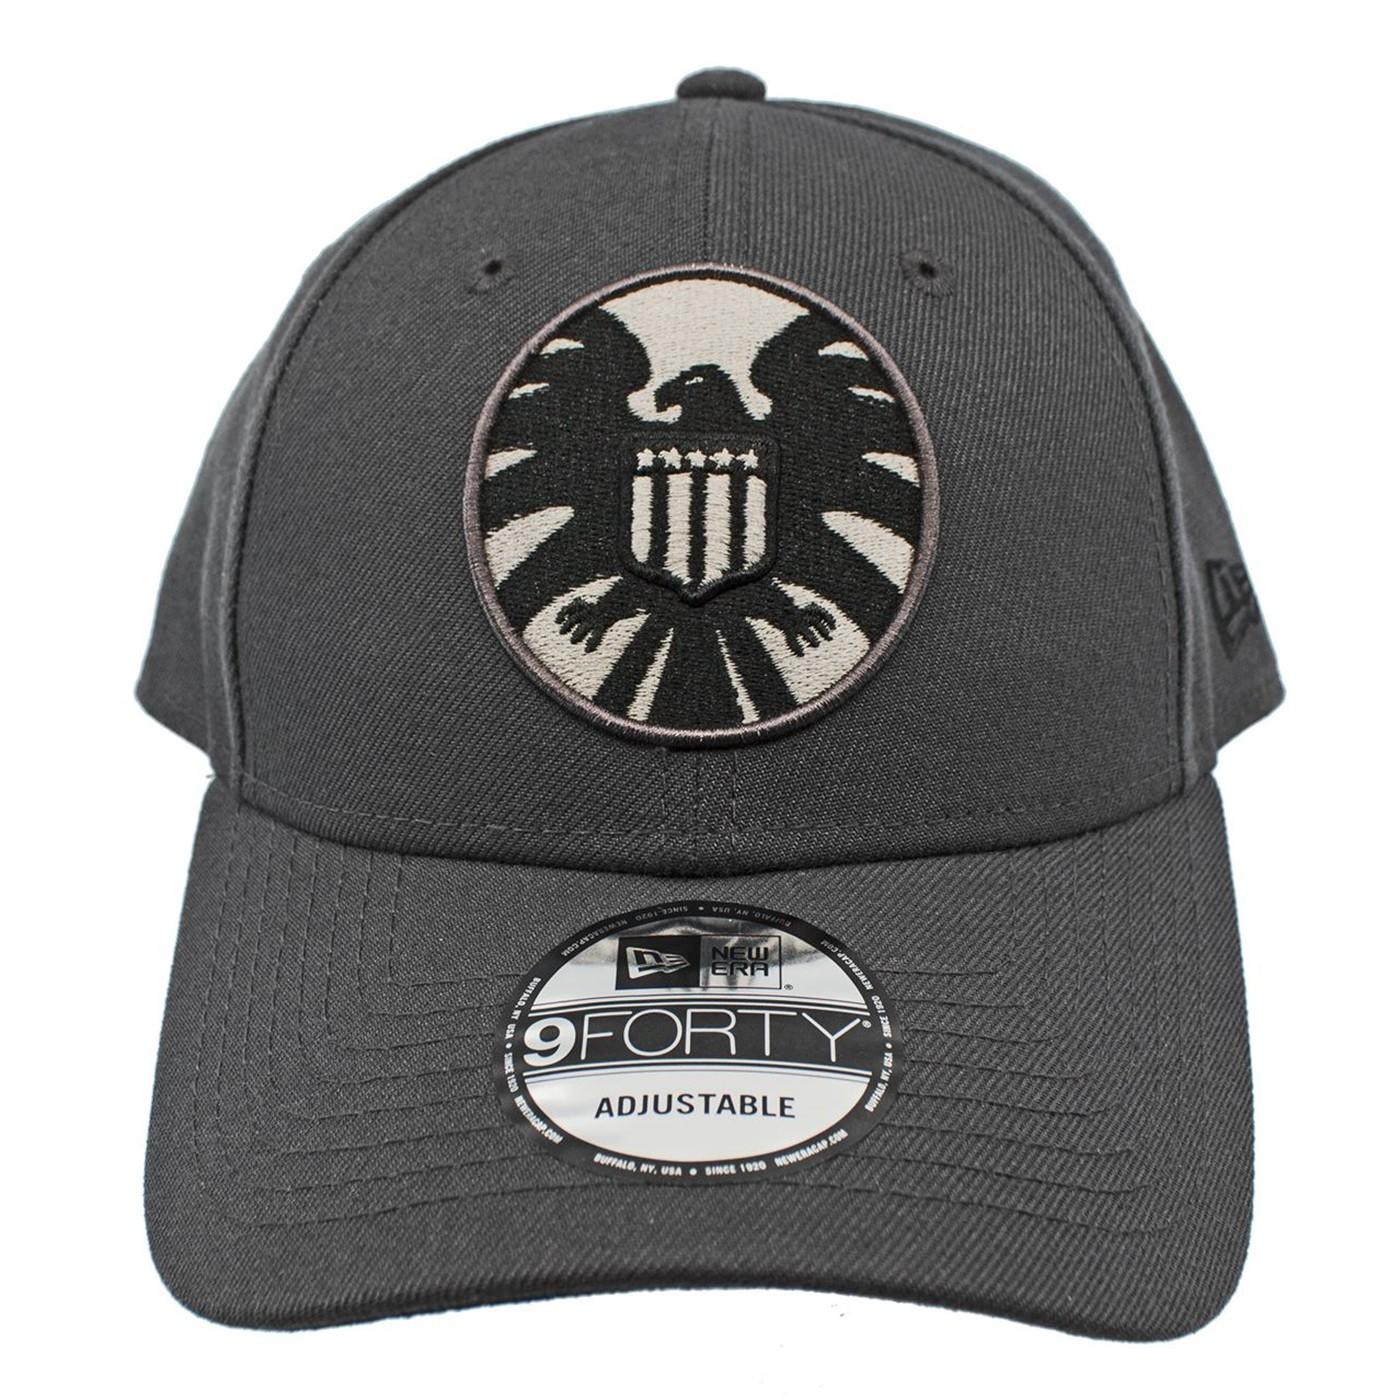 SHIELD Graphite New Era 9Forty Adjustable Hat